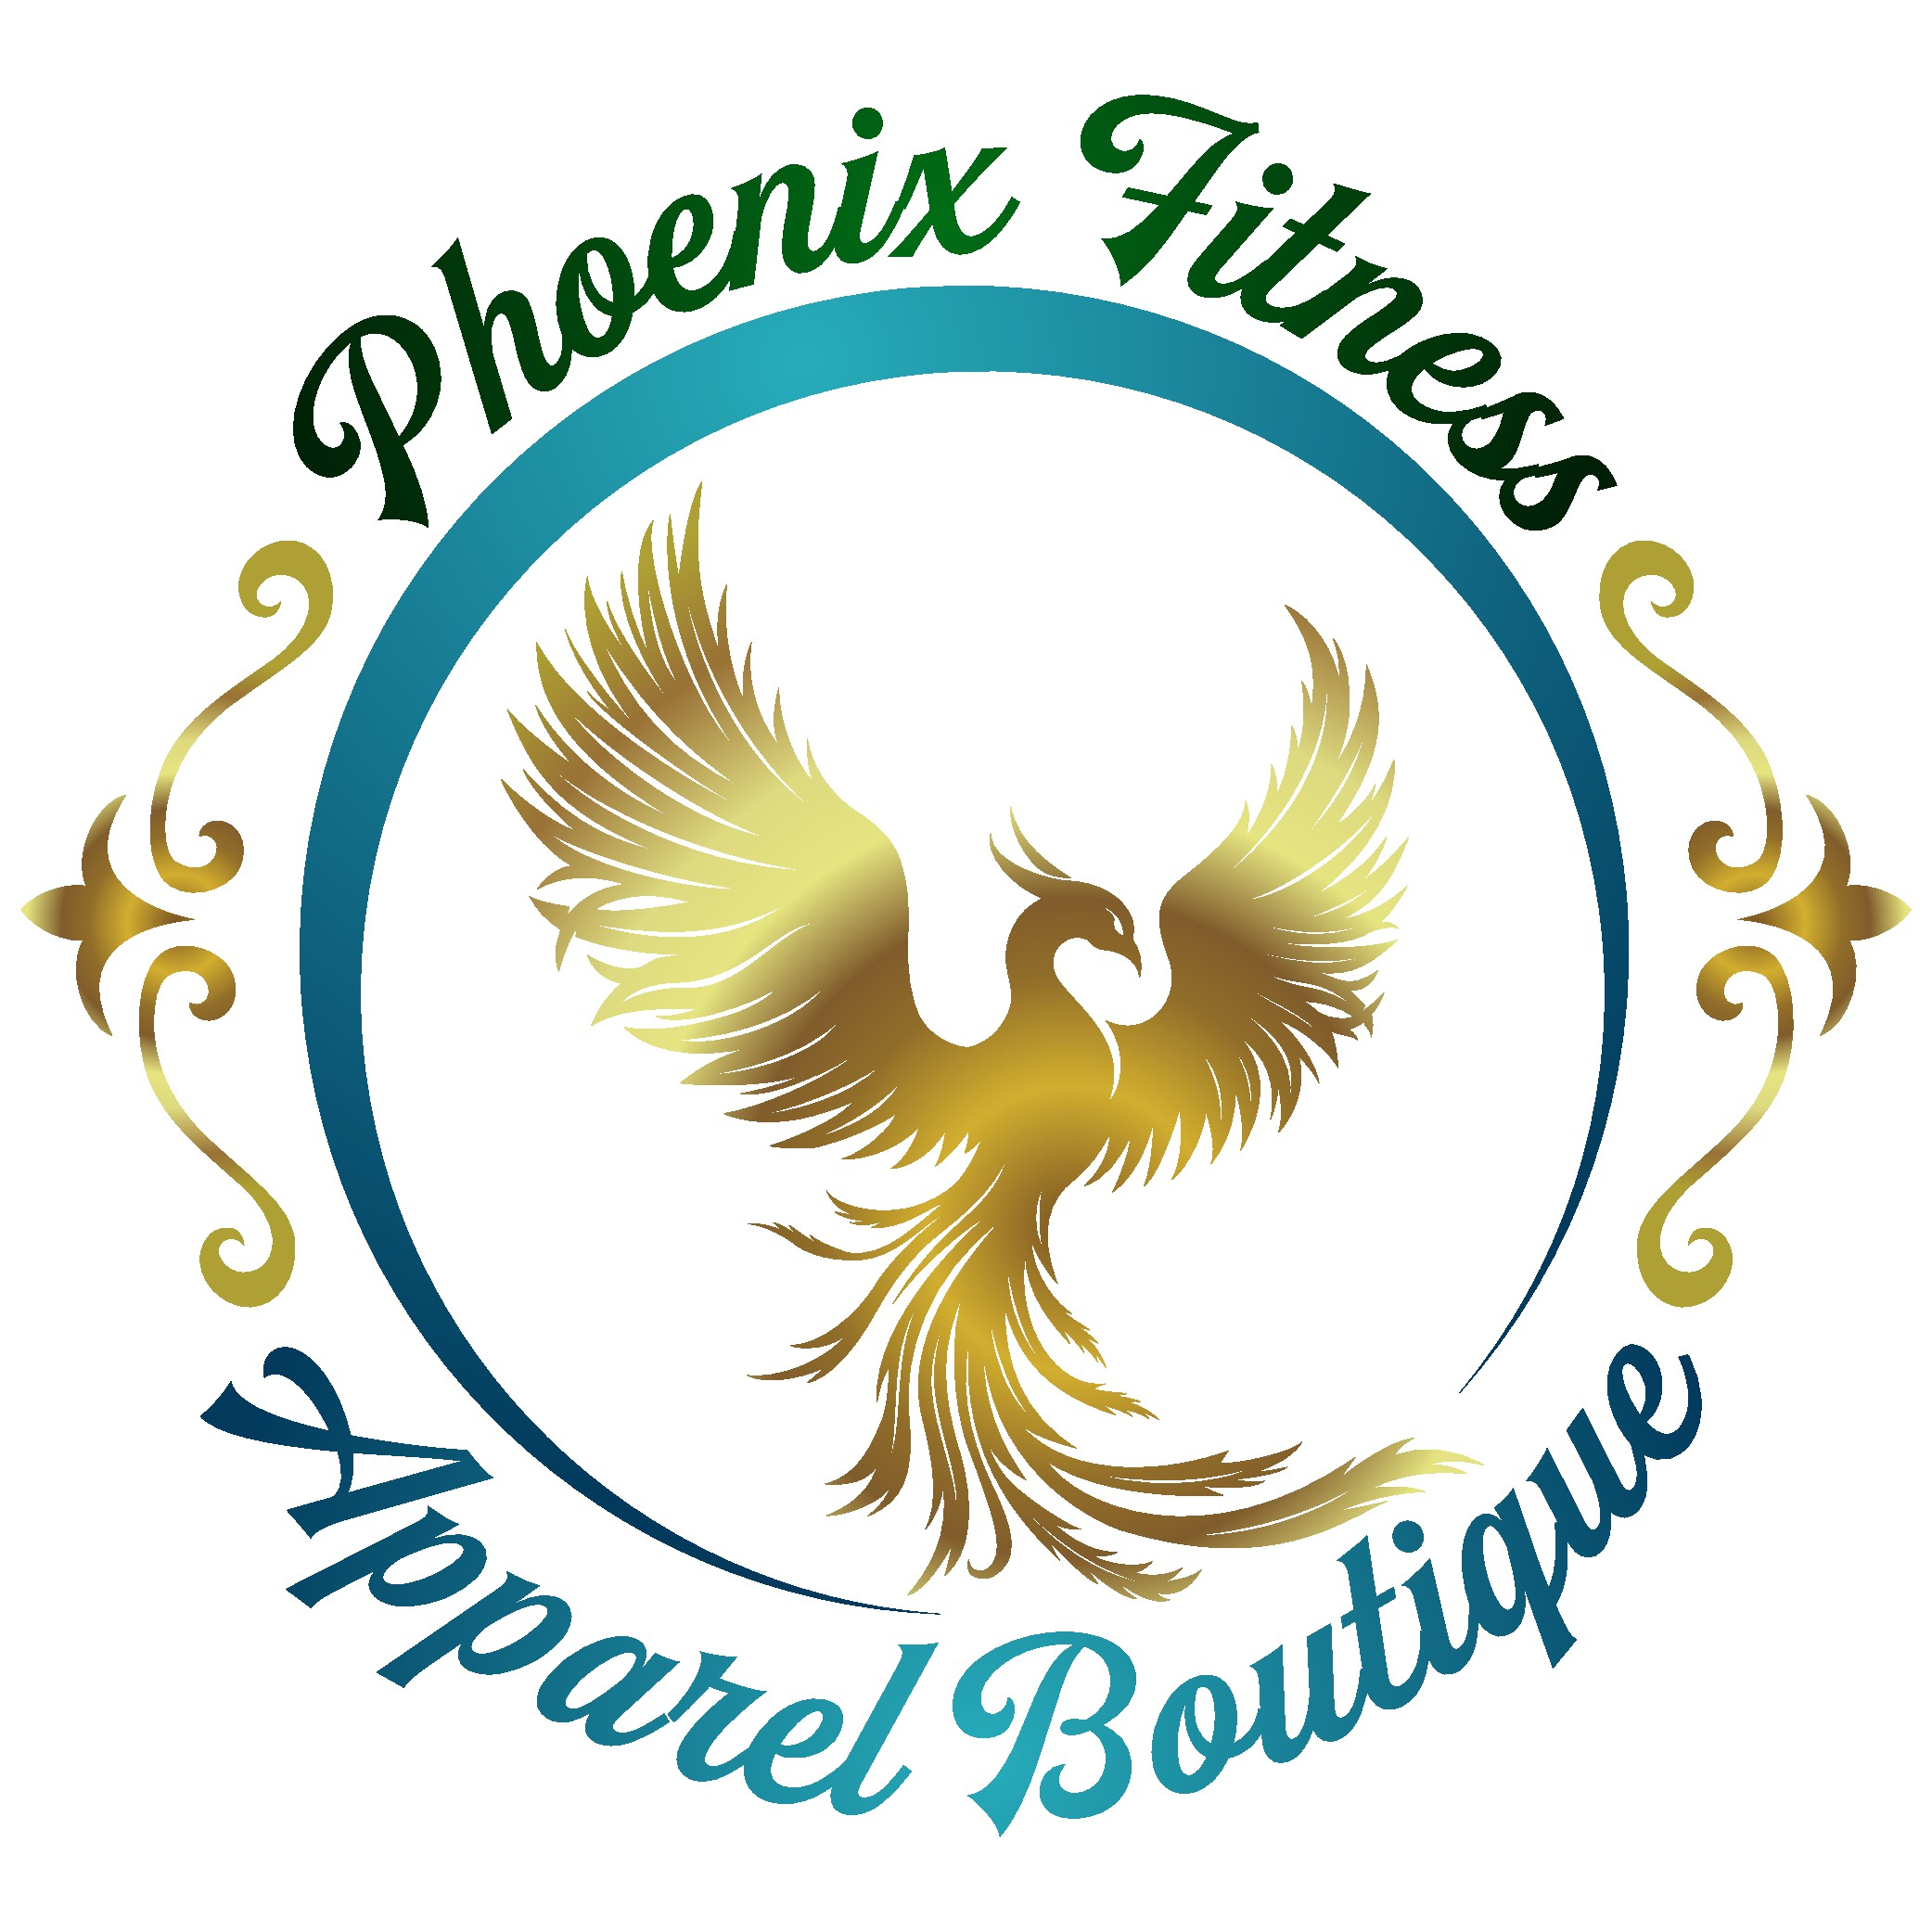 Phoenix Fitness Apparel Boutique Needs a Creative Logo